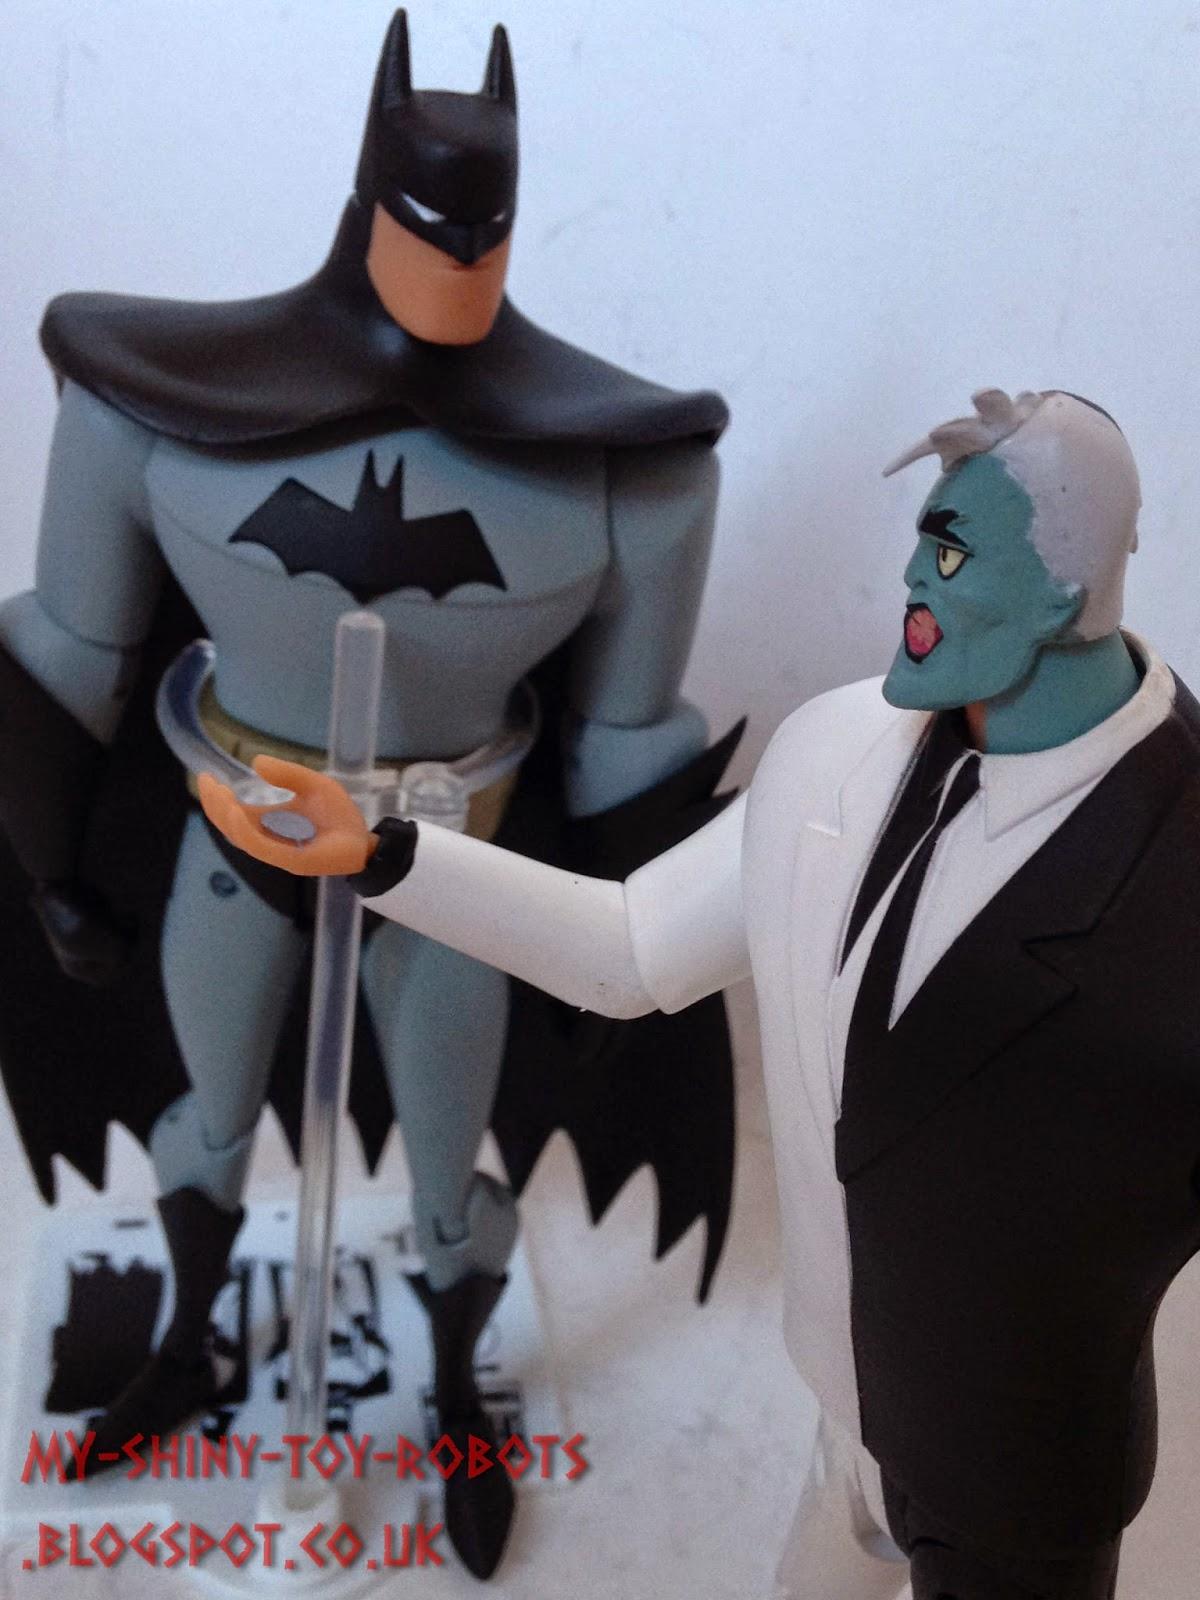 Capturing the Batman